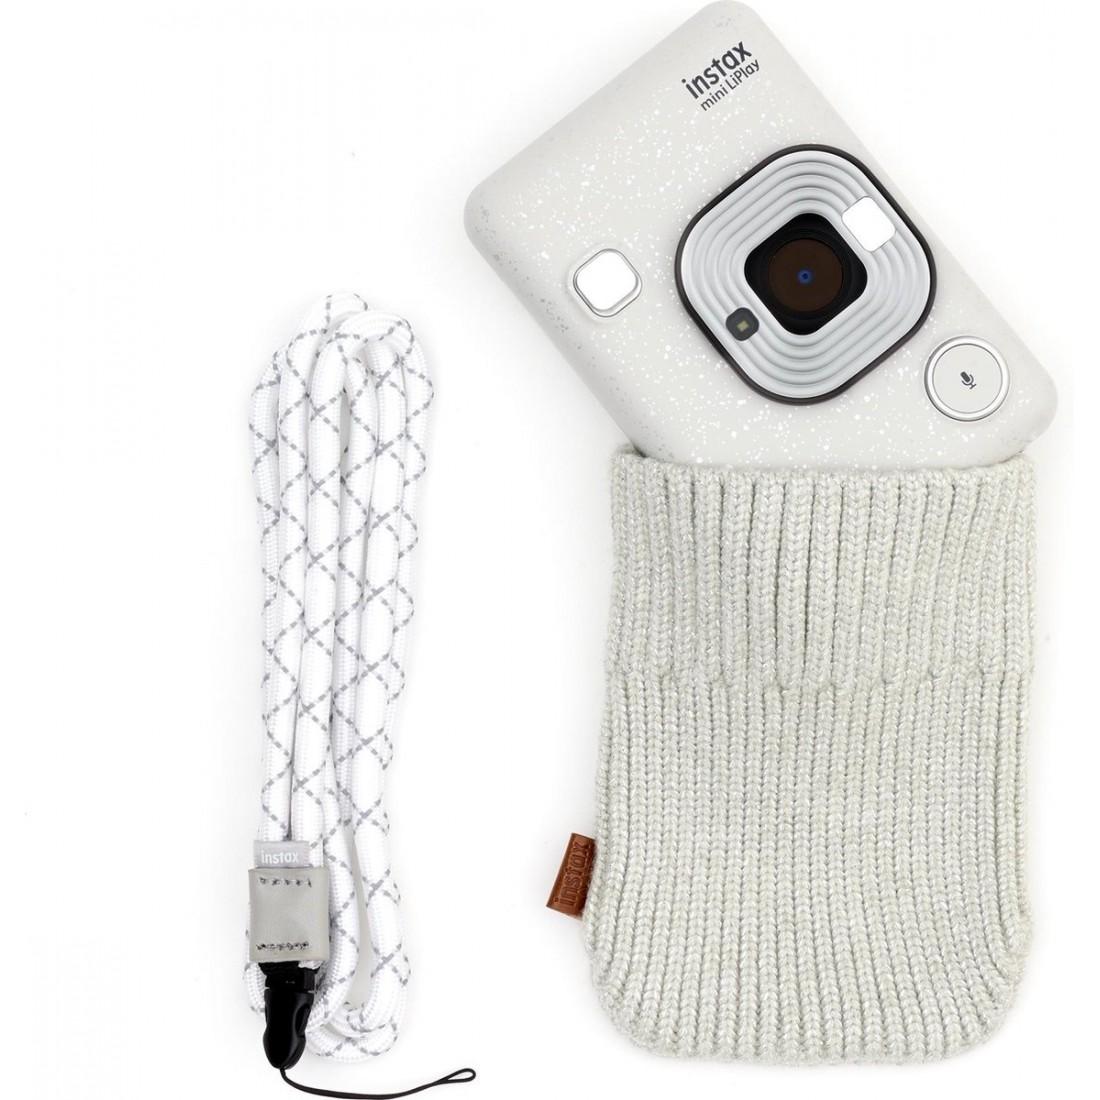 Cámara Fujifilm Instax Mini LiPlay Elegant + correa + funda, color Blanco